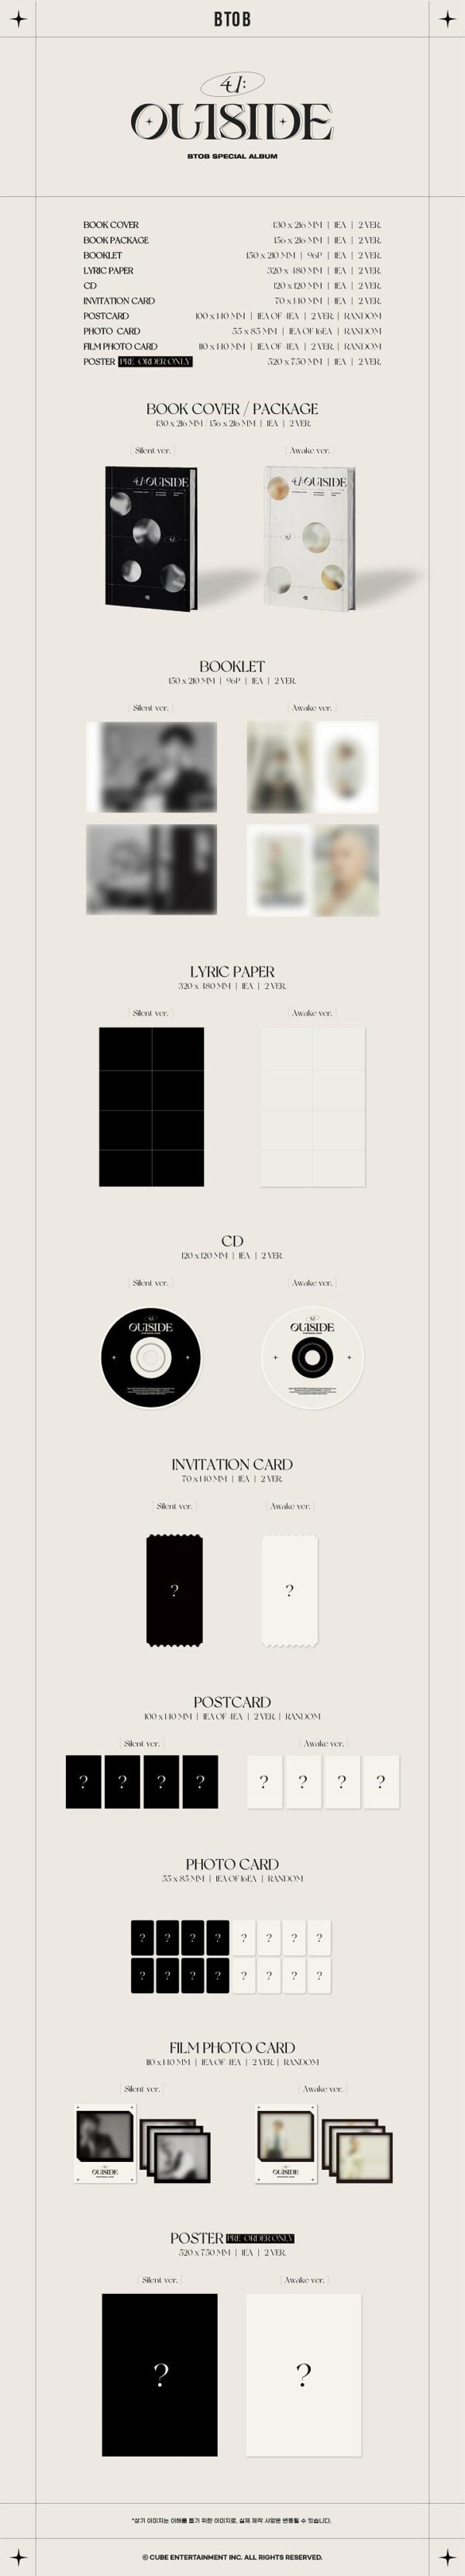 Special Album de BTOB 4U OUTSIDE Silent ver. o Awake ver. Disponibles 1